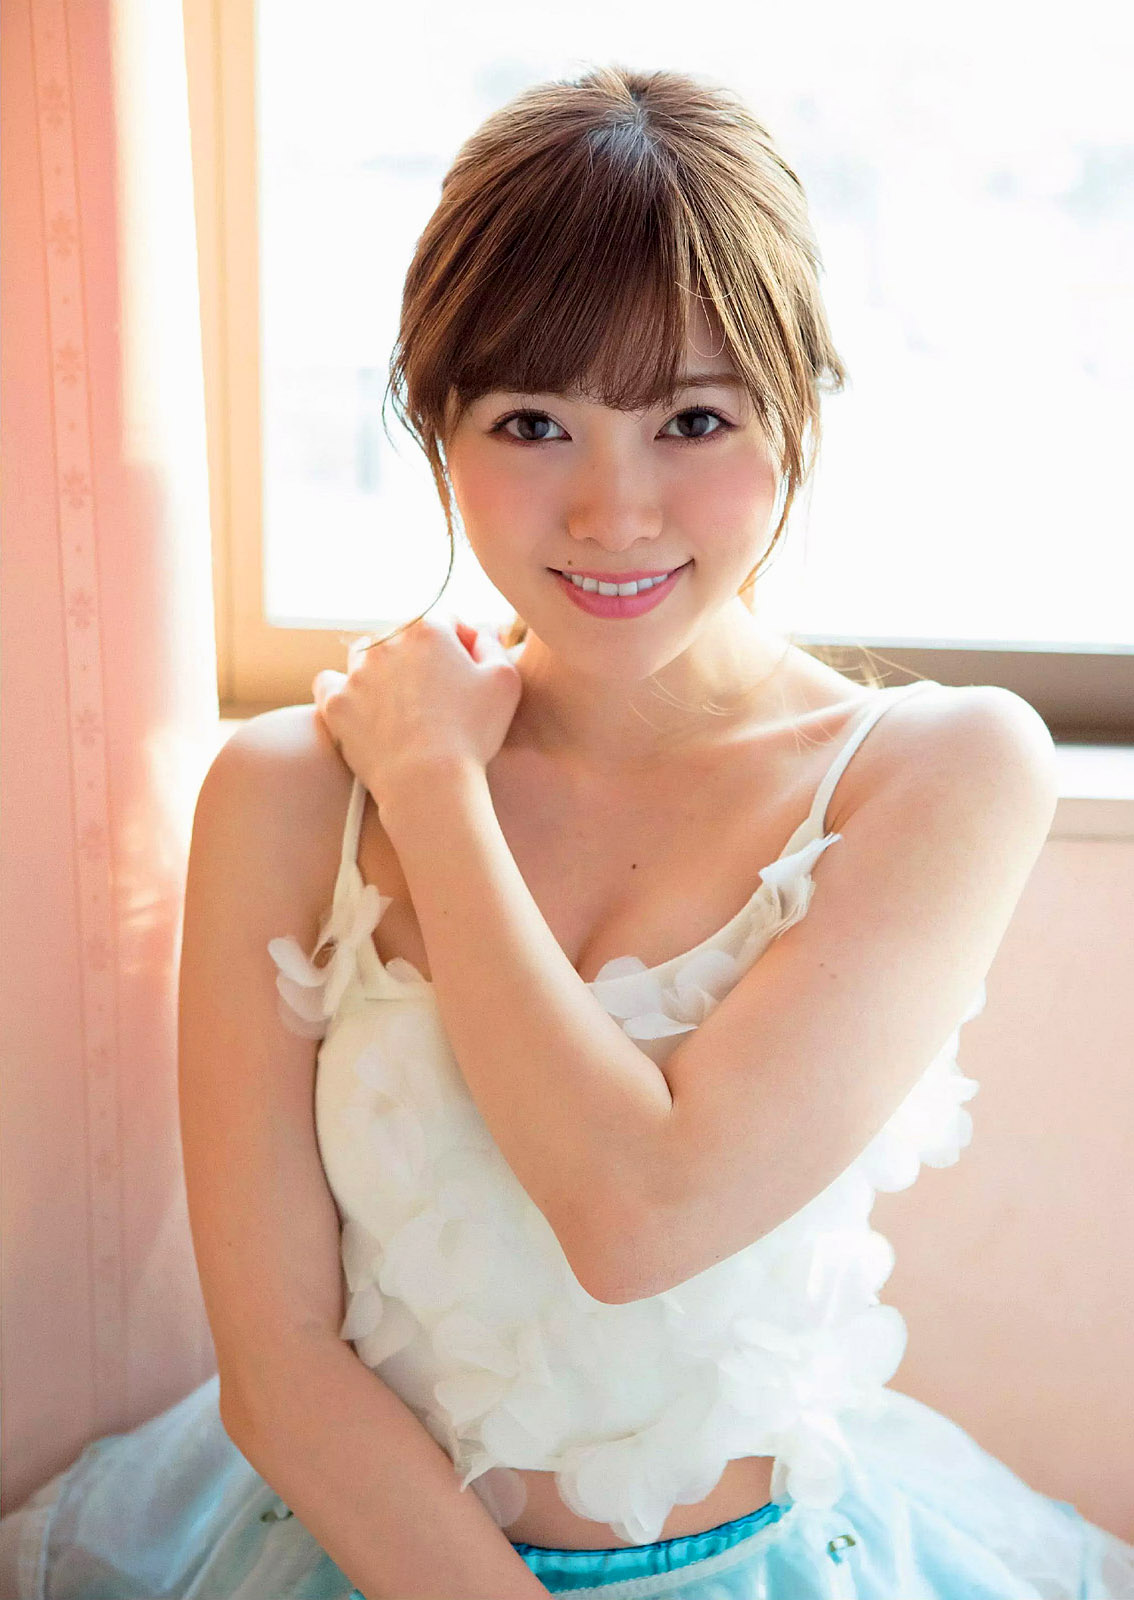 MShiraishi WPB 150223 05.jpg